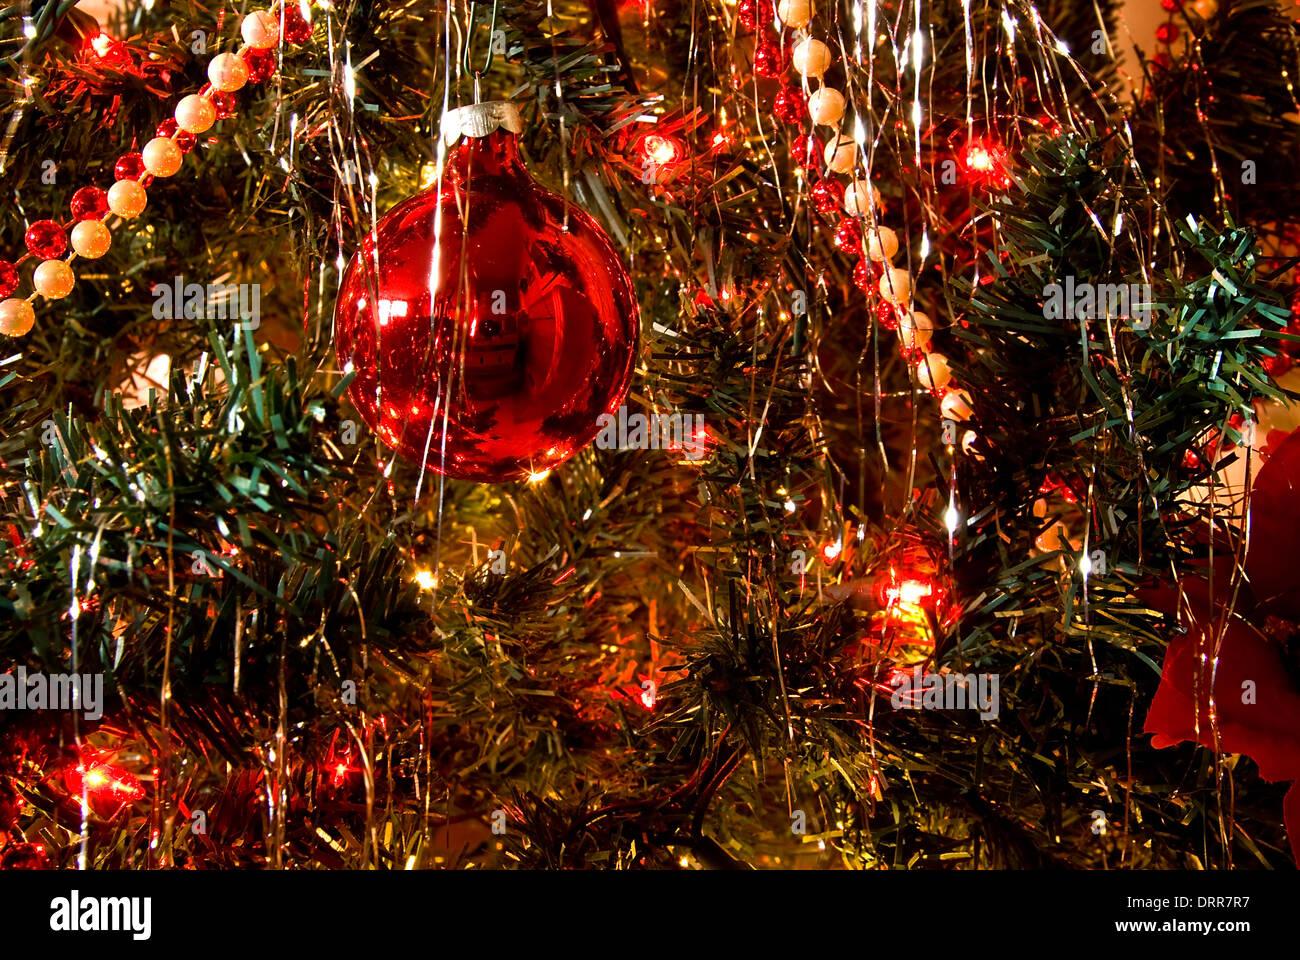 Christmas Tree Decorations Tinsel Garland Stock Photos Christmas